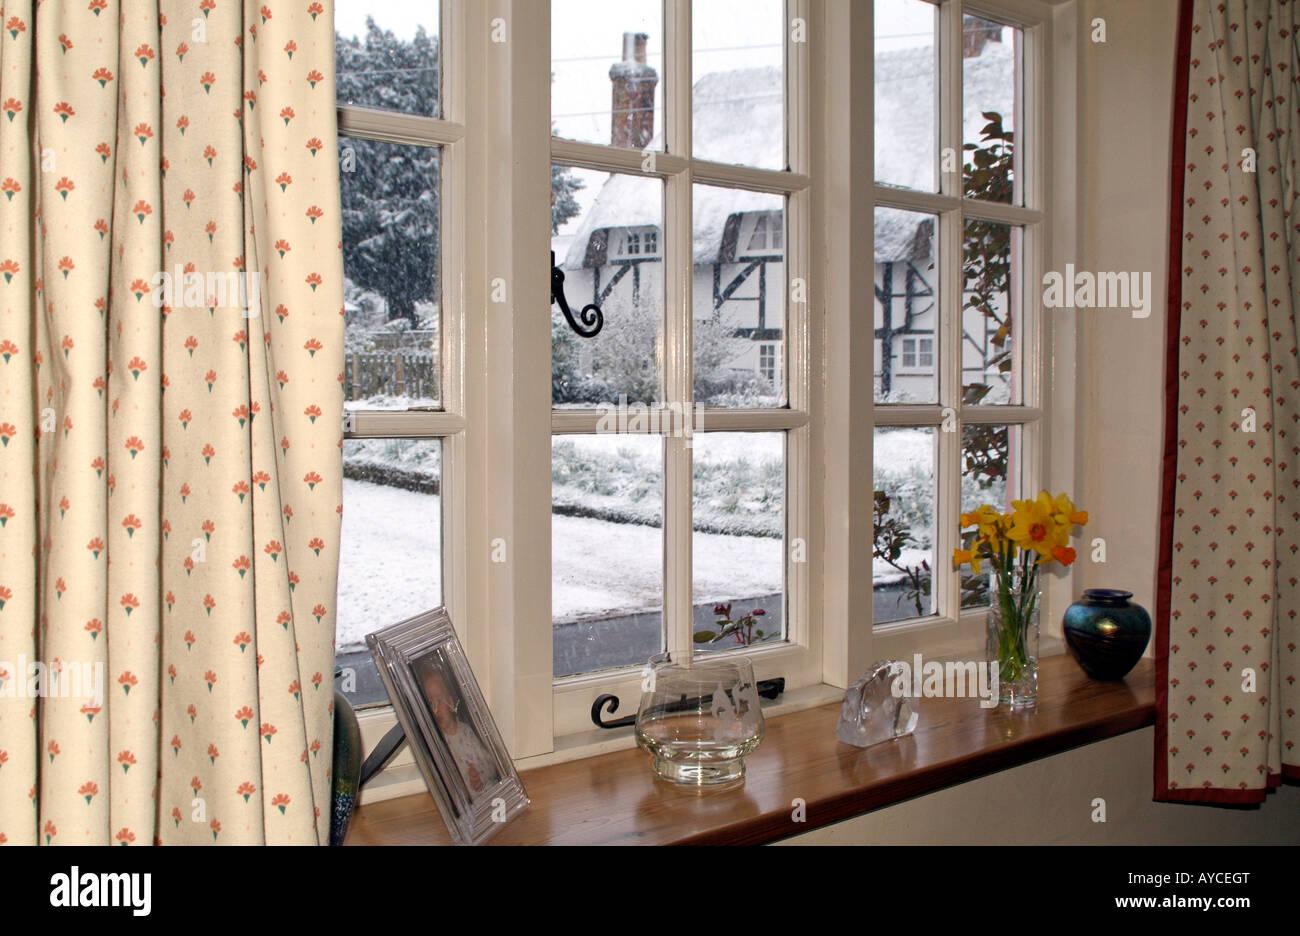 Winter Snow Scene England UK Gloomy Outlook Viewed From a Window - Stock Image